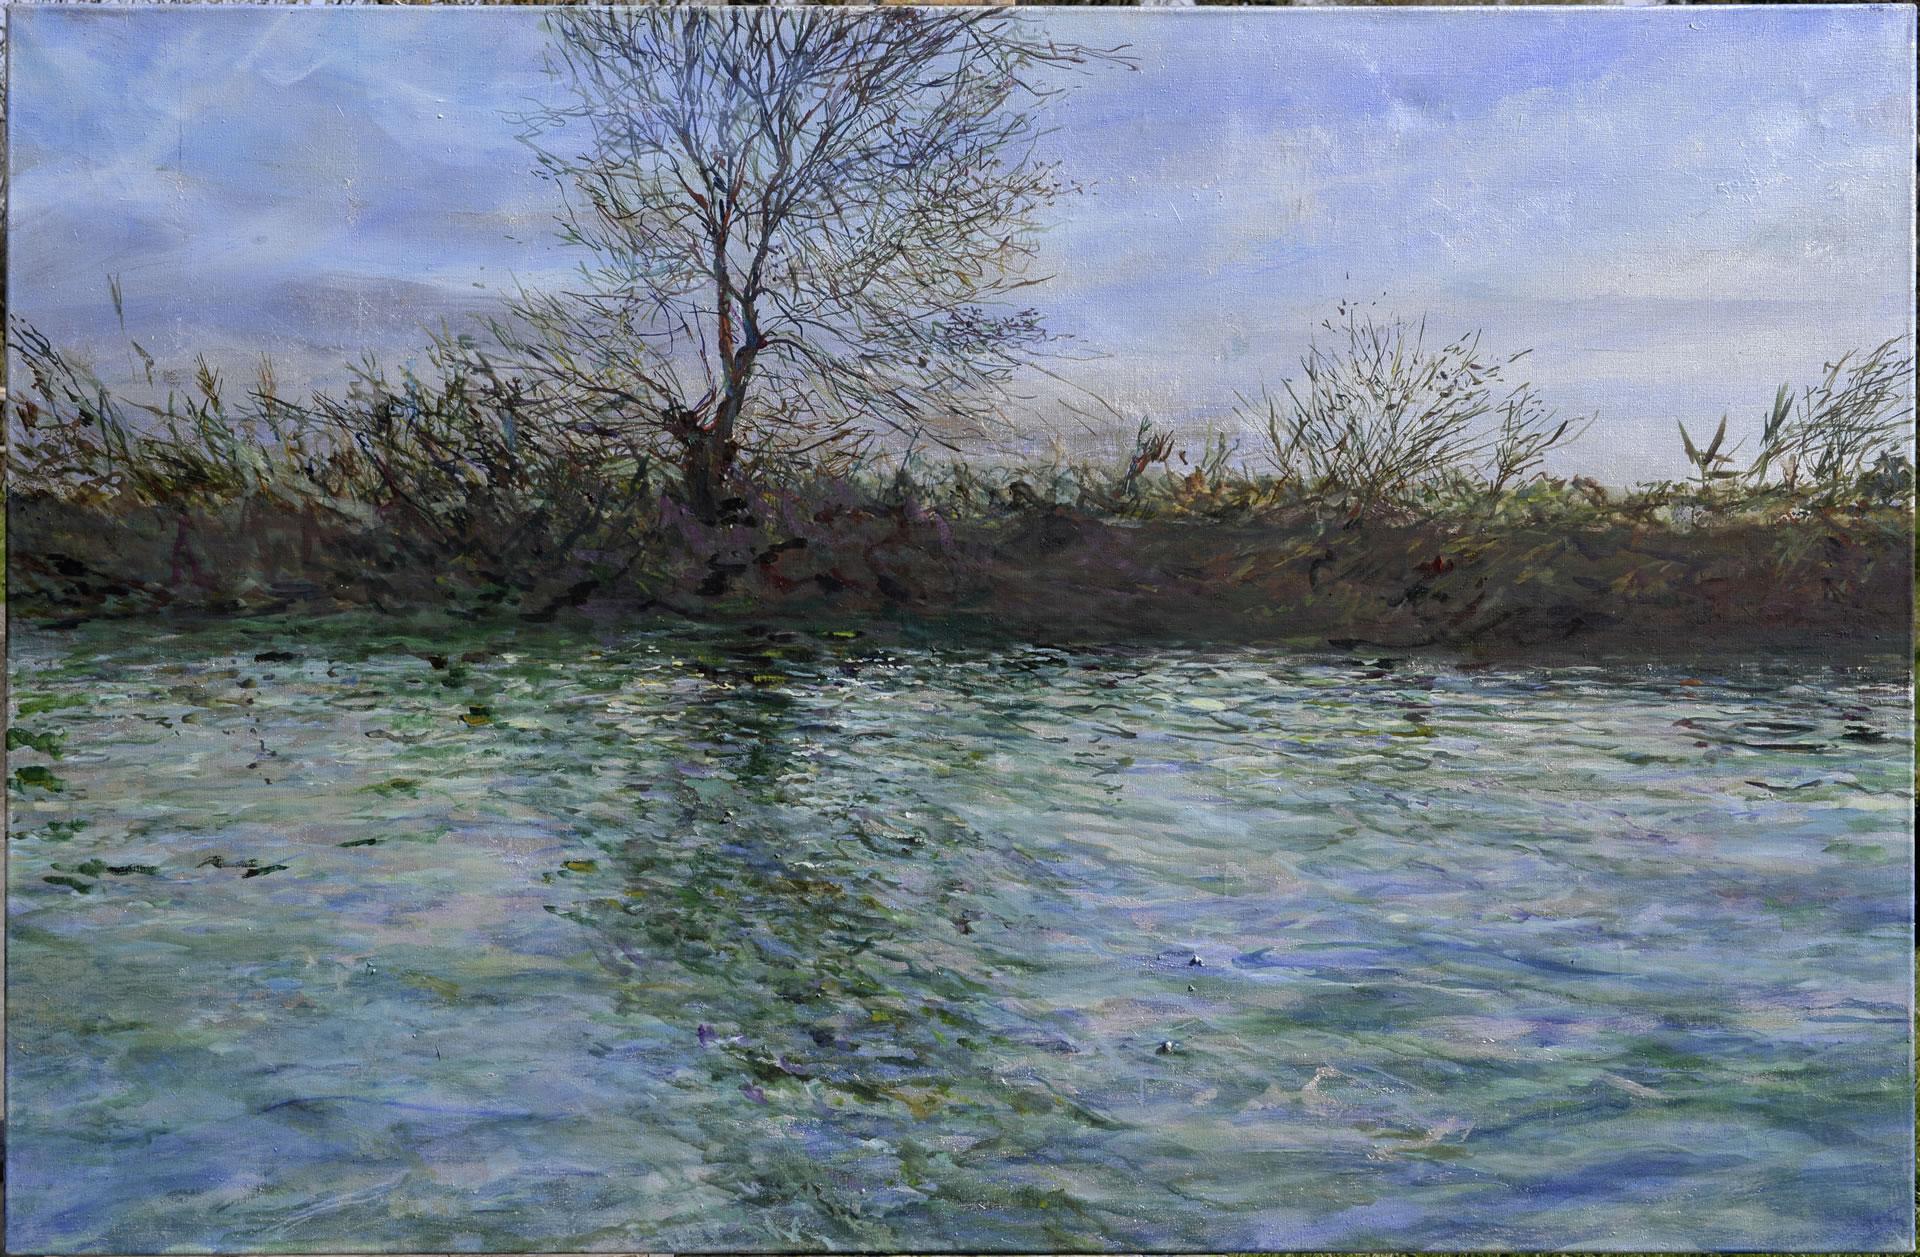 FLUX23 | Markus Orsini-Rosenberg | Lagune bei Grado 1 | 2017 | 110 x 170 cm